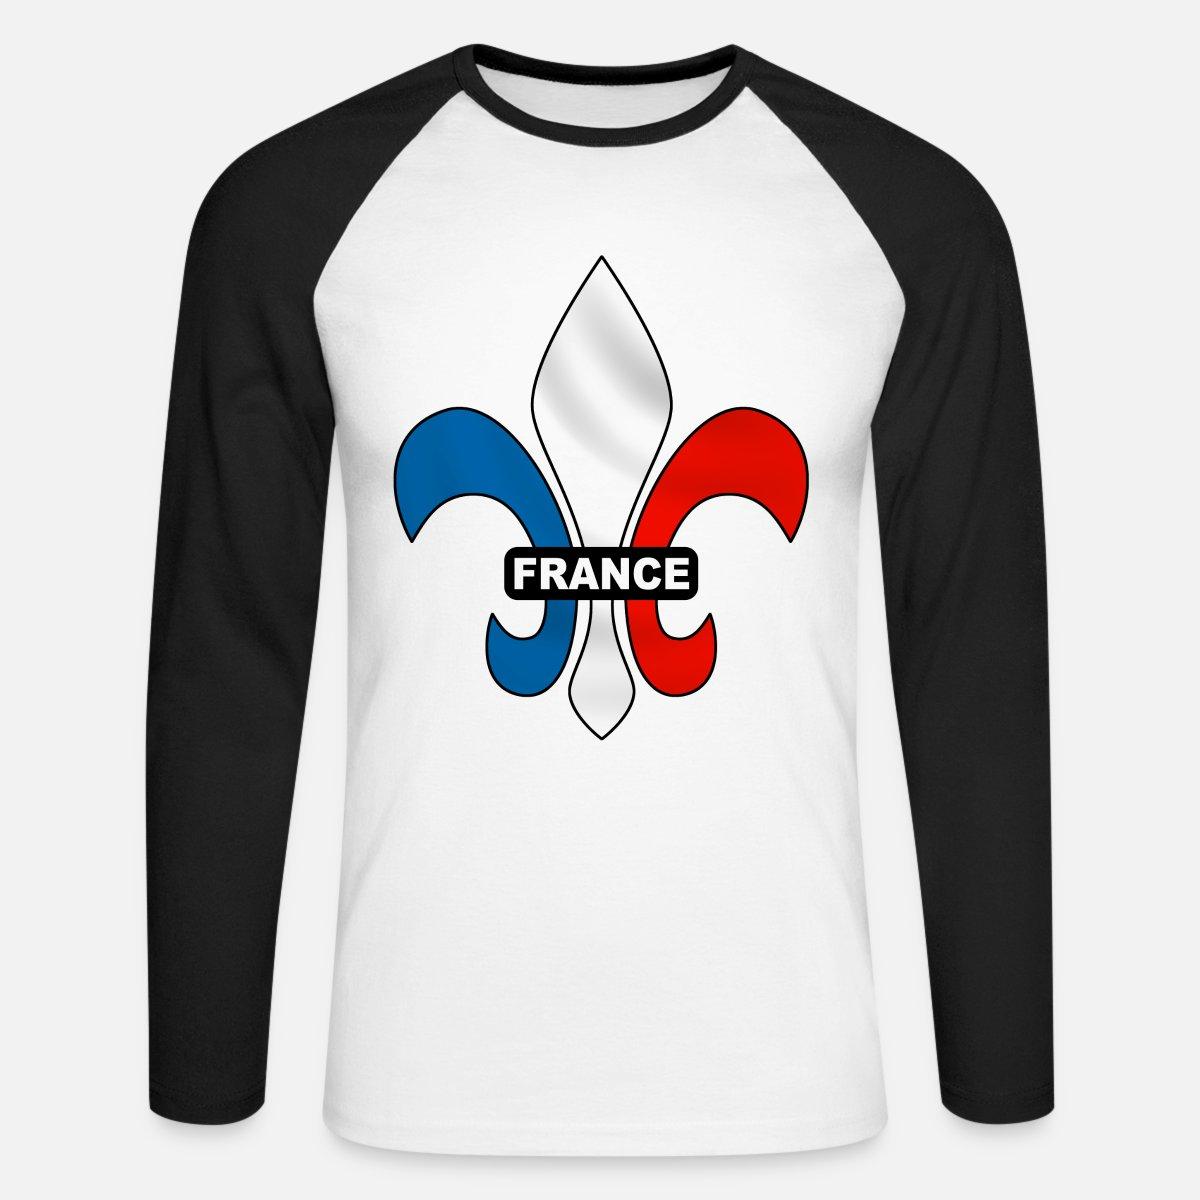 0ee9761ae4257 france - fleur de lys T-shirt manches longues baseball Homme   Spreadshirt